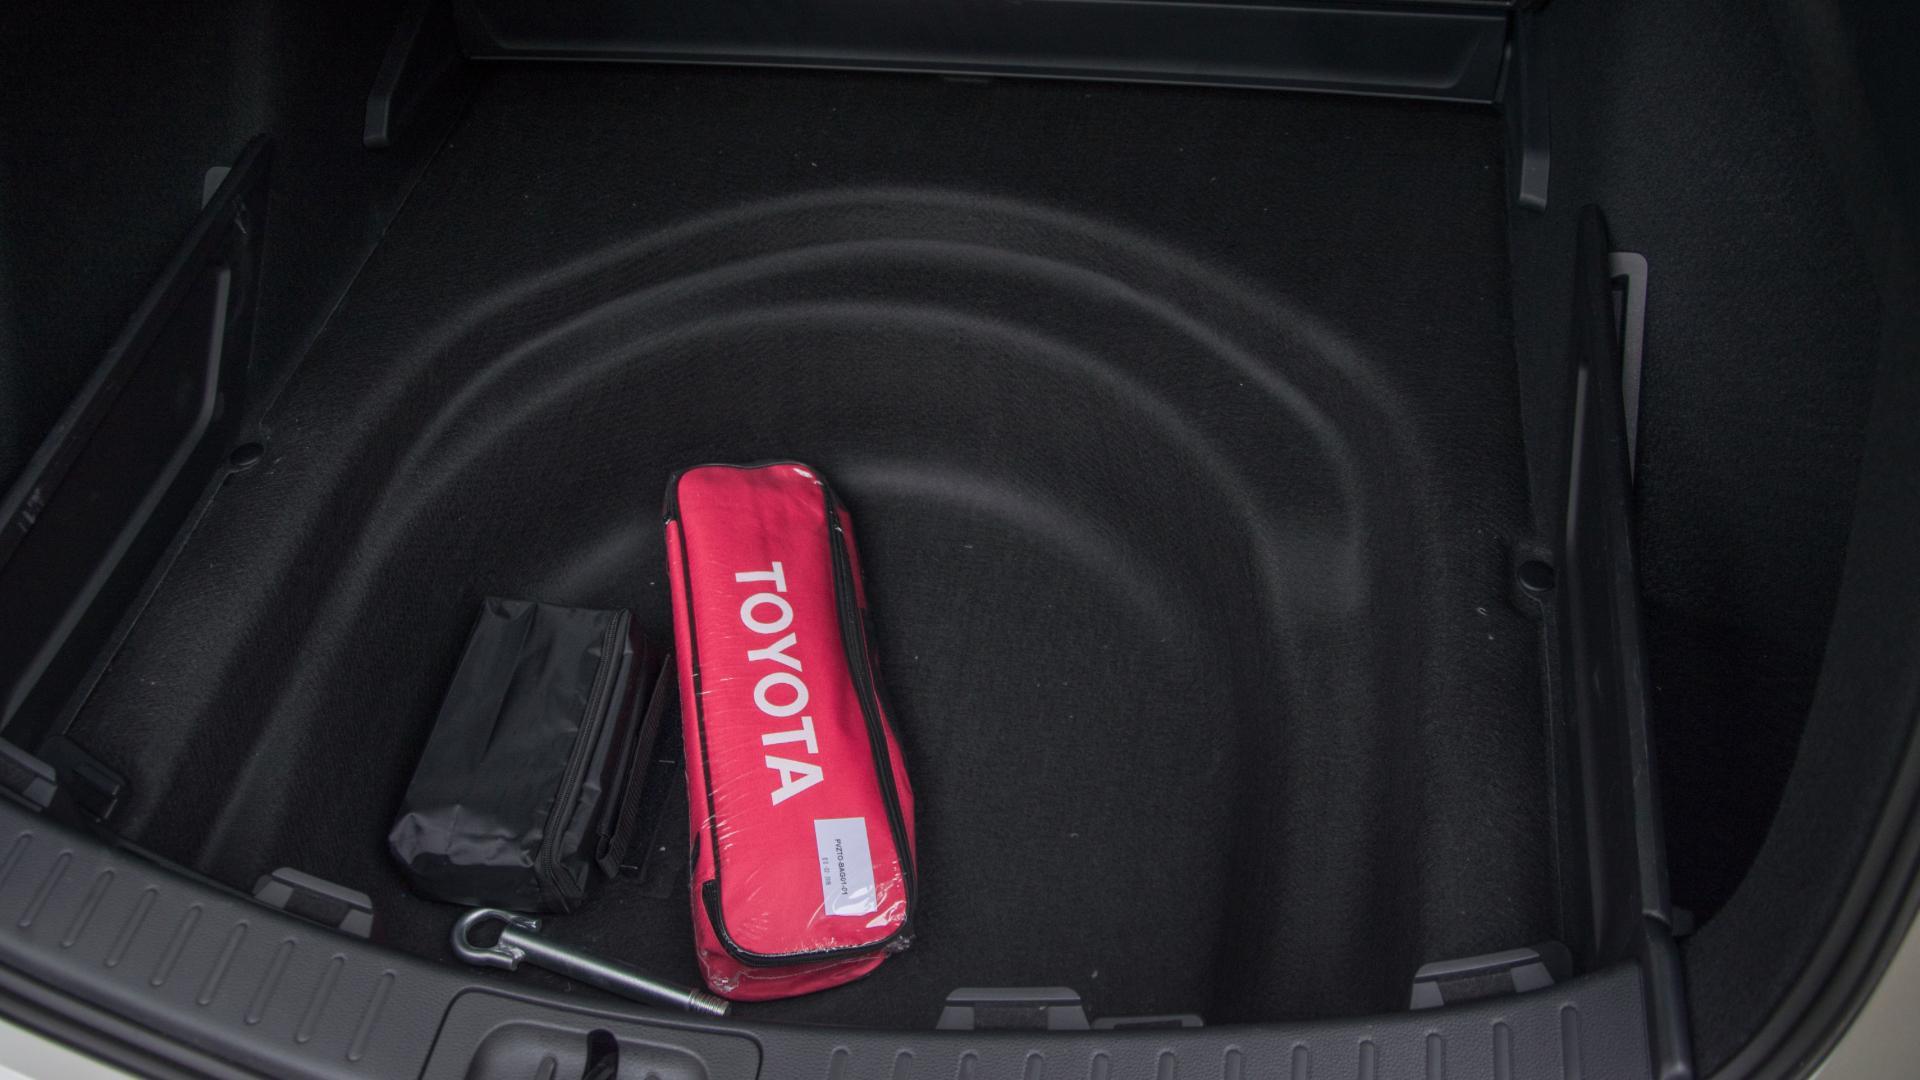 Dvojité dno zavazadlového prostoru